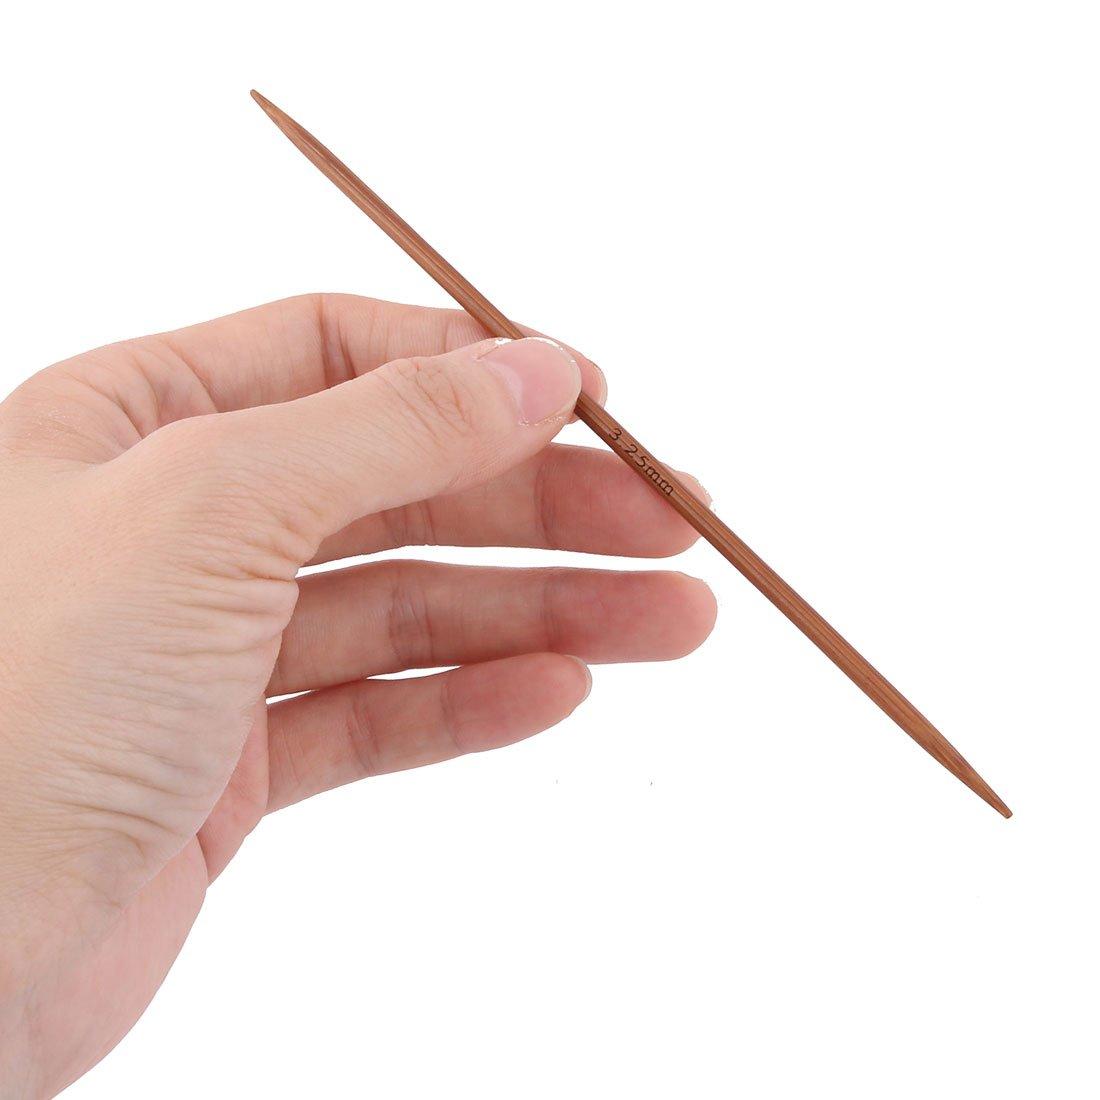 uxcell Bamboo Sewing Knitting Tatting Hat Socks Golves Needles 2.5mm Dia 4pcs Brown